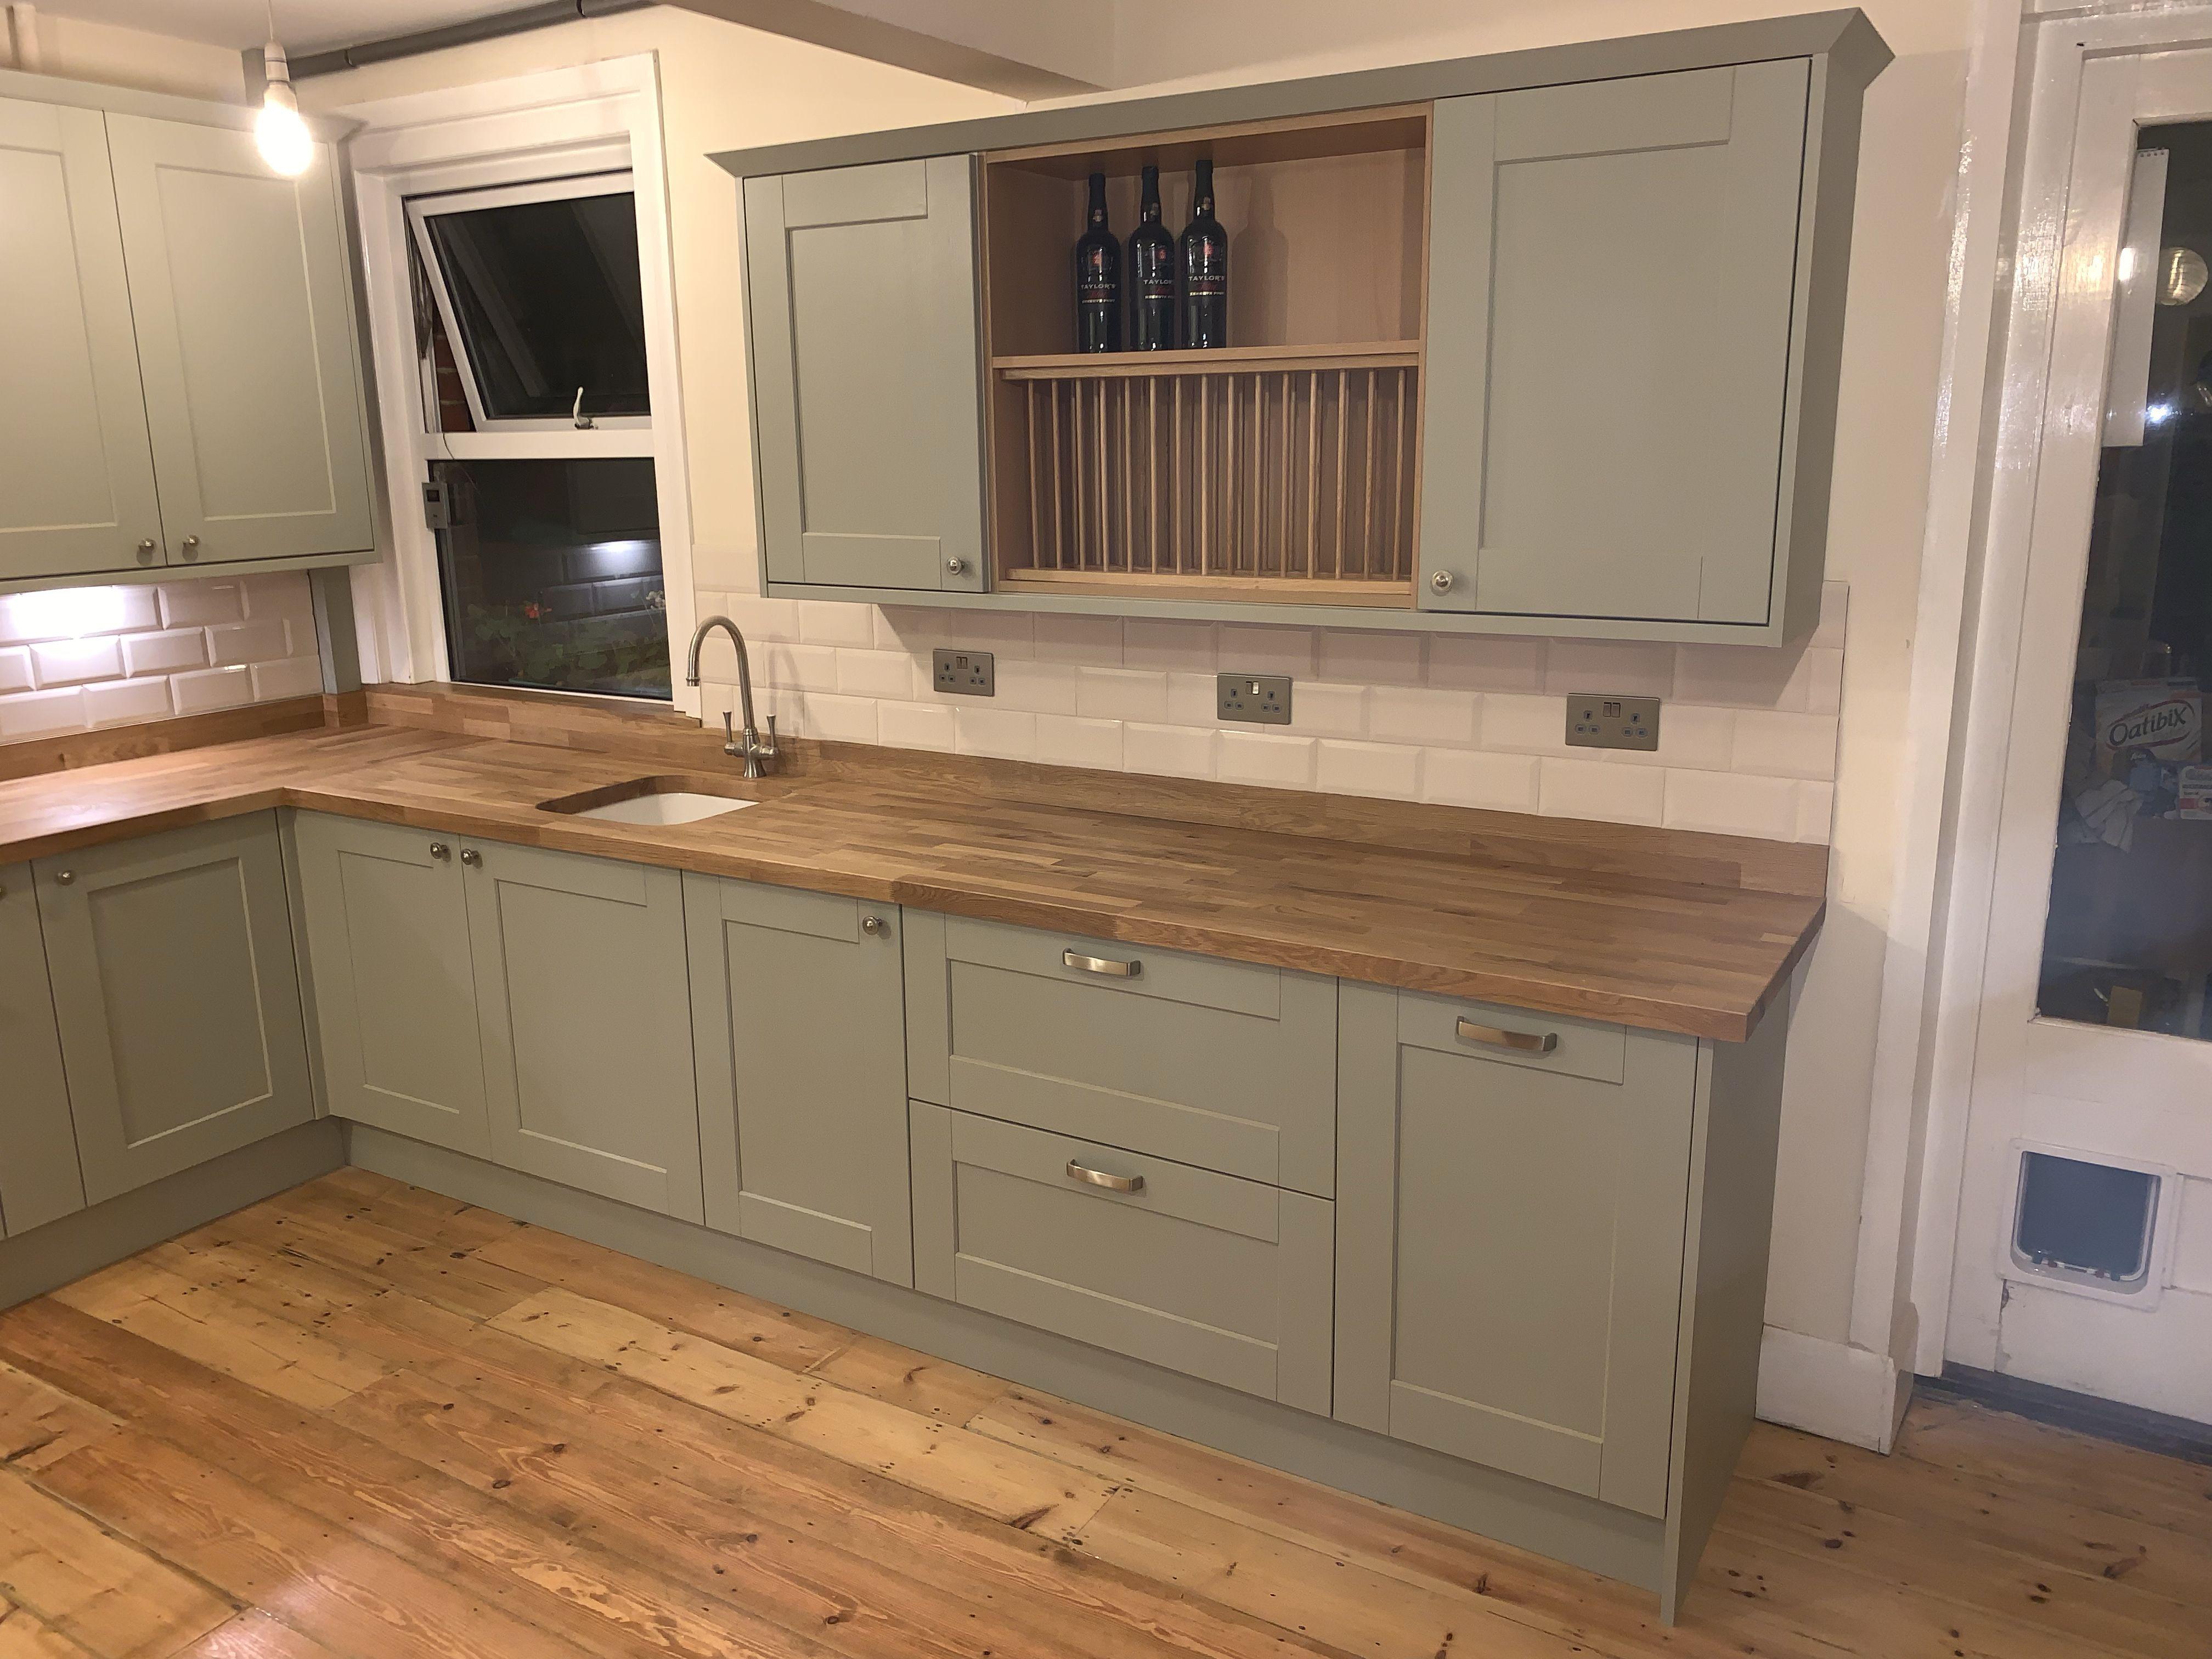 Shaker Style Sage Green Kitchen Design Decor Home Decor Kitchen Rustic Kitchen